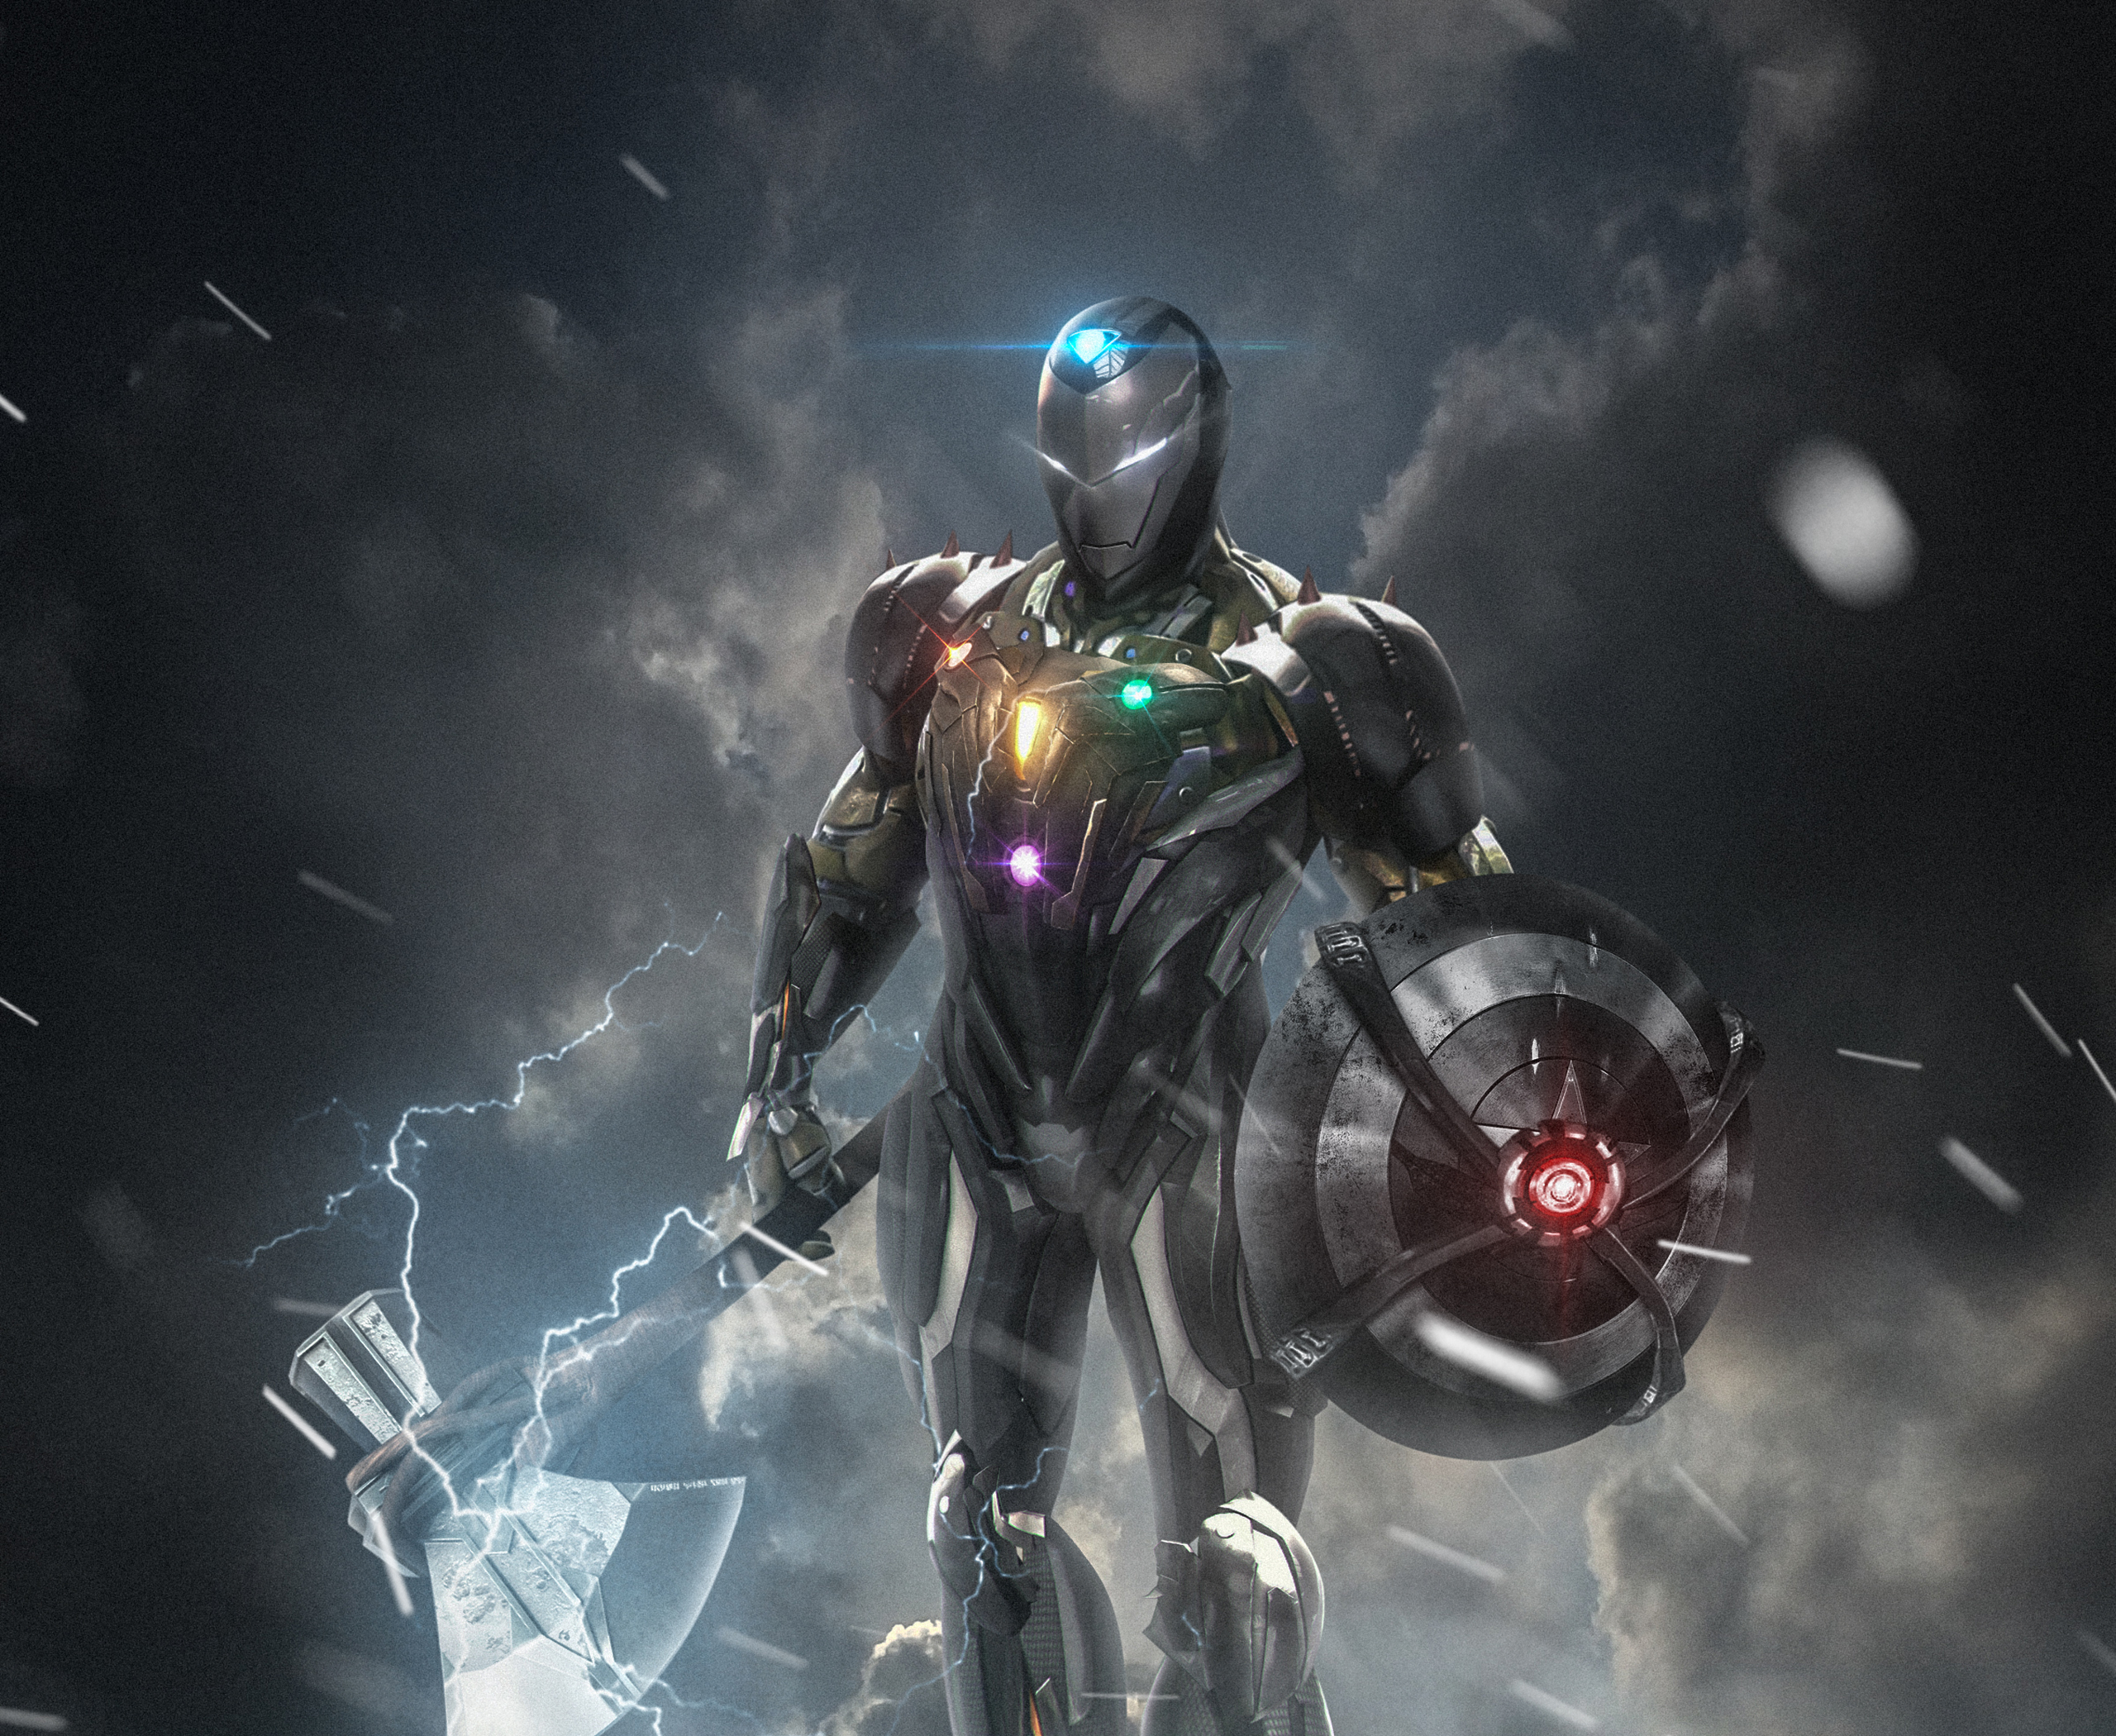 Unduh 800+ Wallpaper Keren Avengers Endgame HD Paling Baru